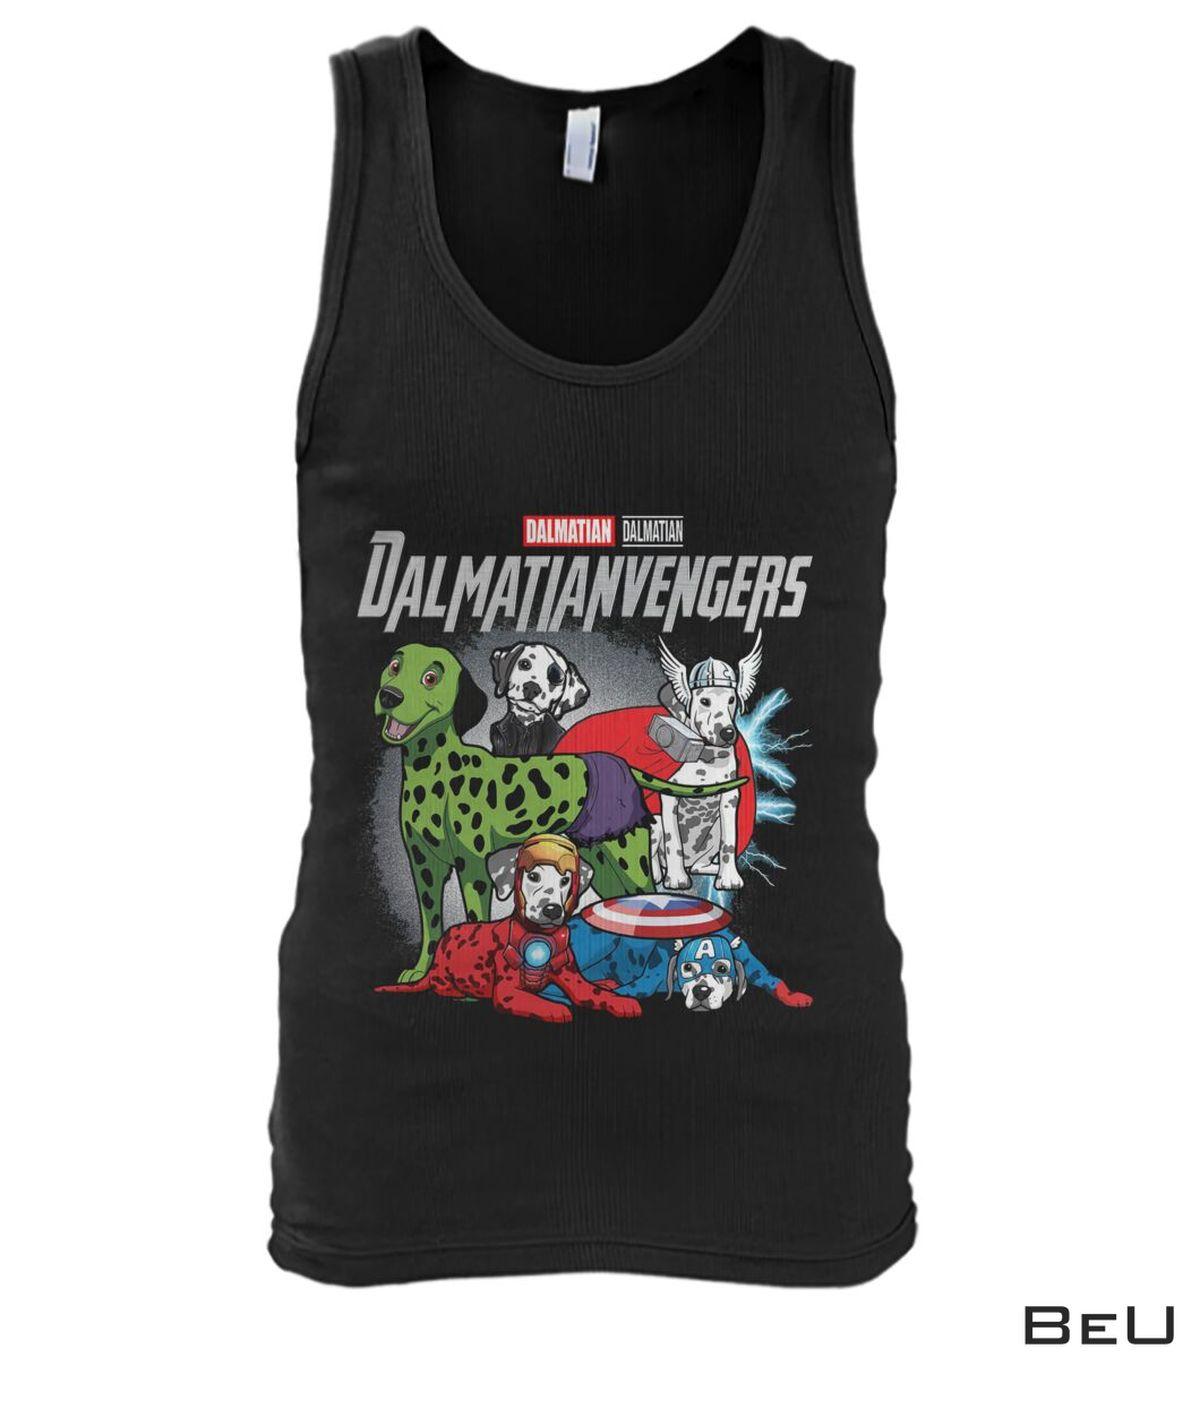 Dalmatian Dalmatianvengers Avengers Shirtx